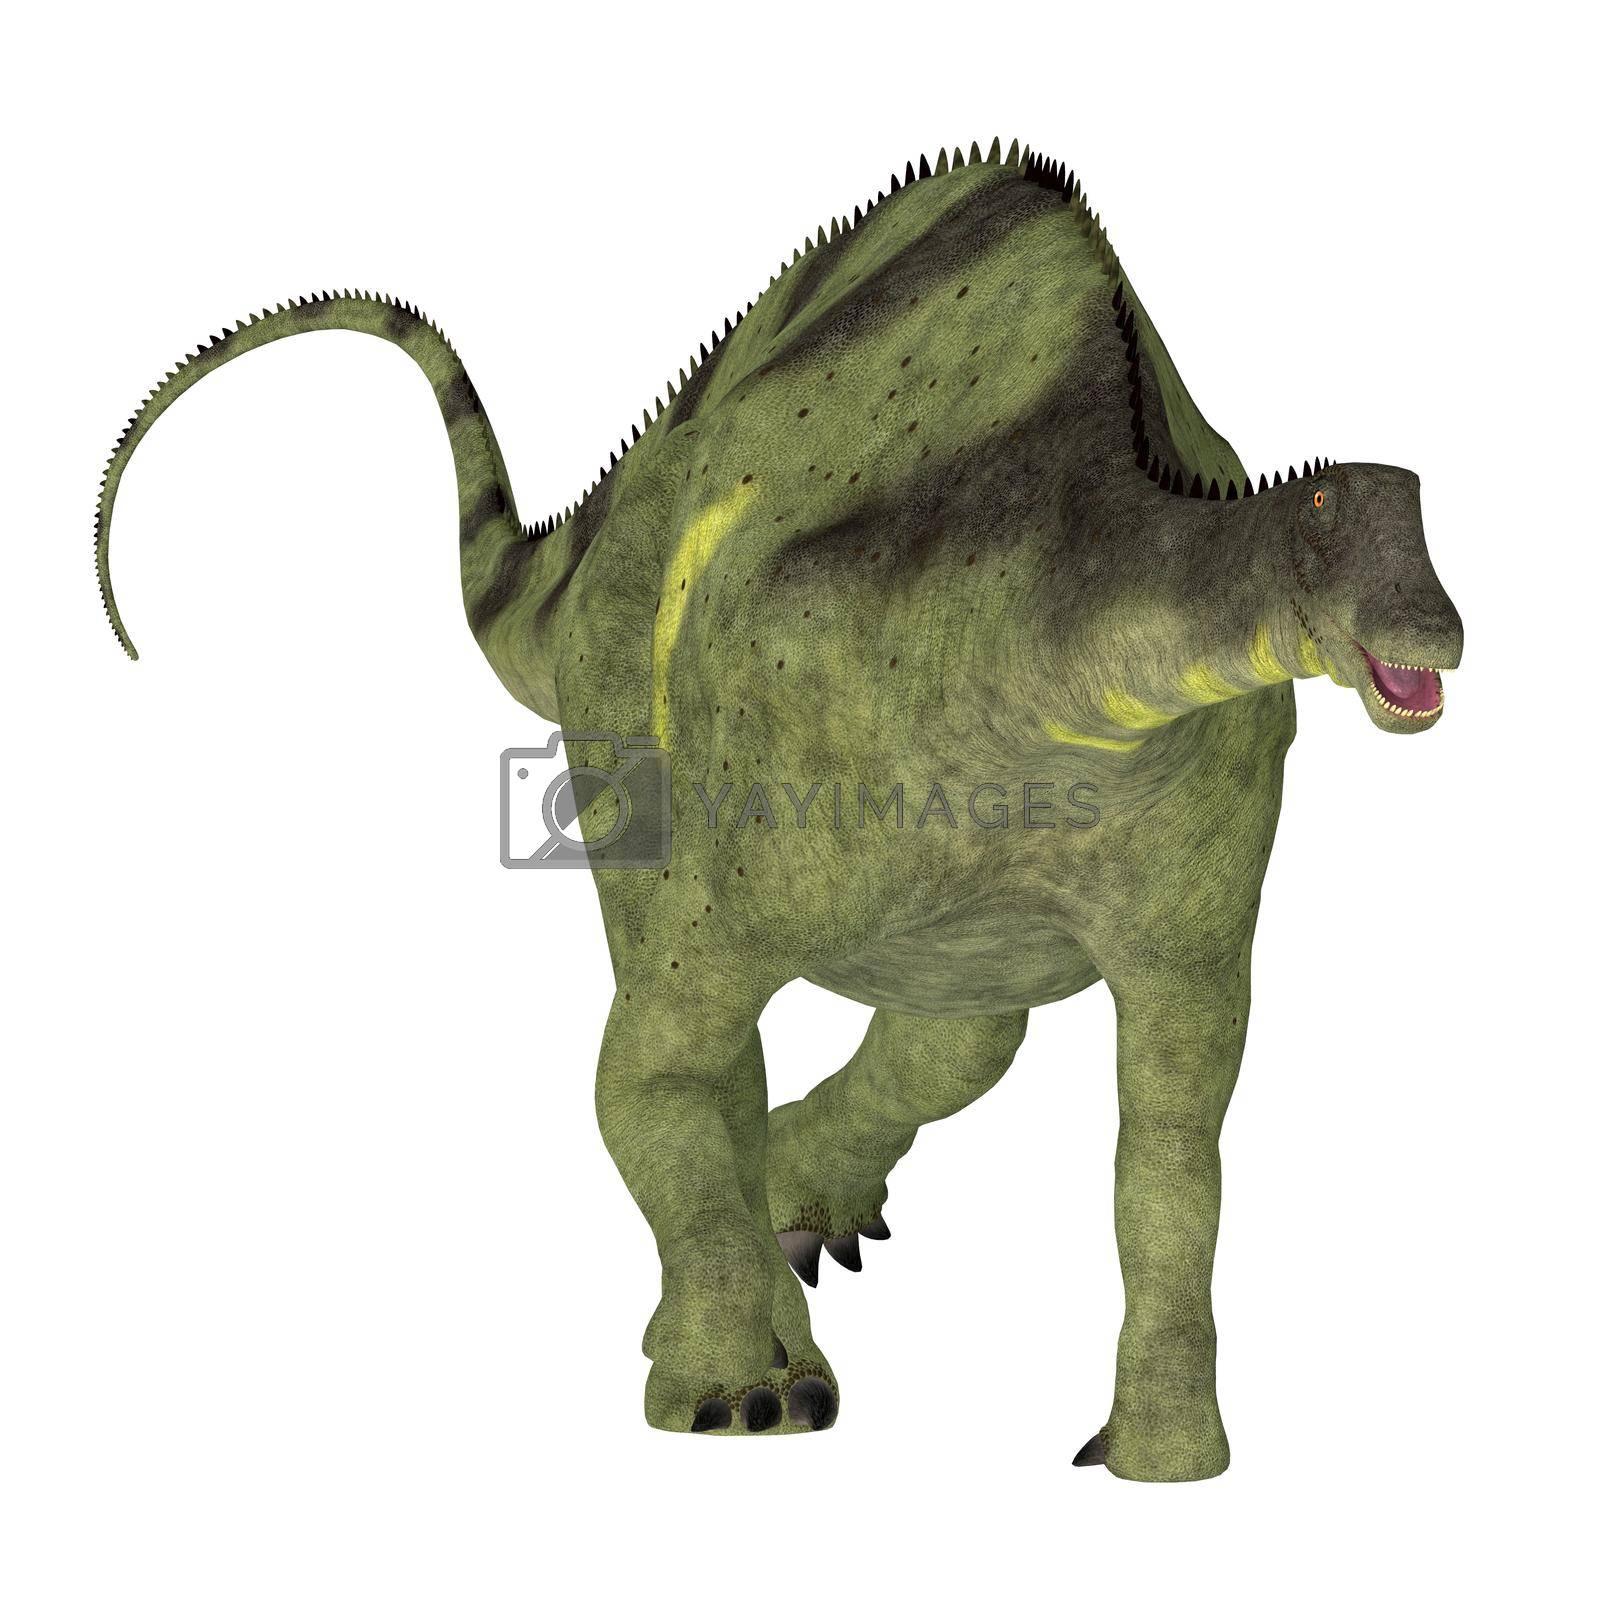 Brachytrachelopan was a sauropod herbivorous dinosaur that lived in Argentina during the Jurassic Period.